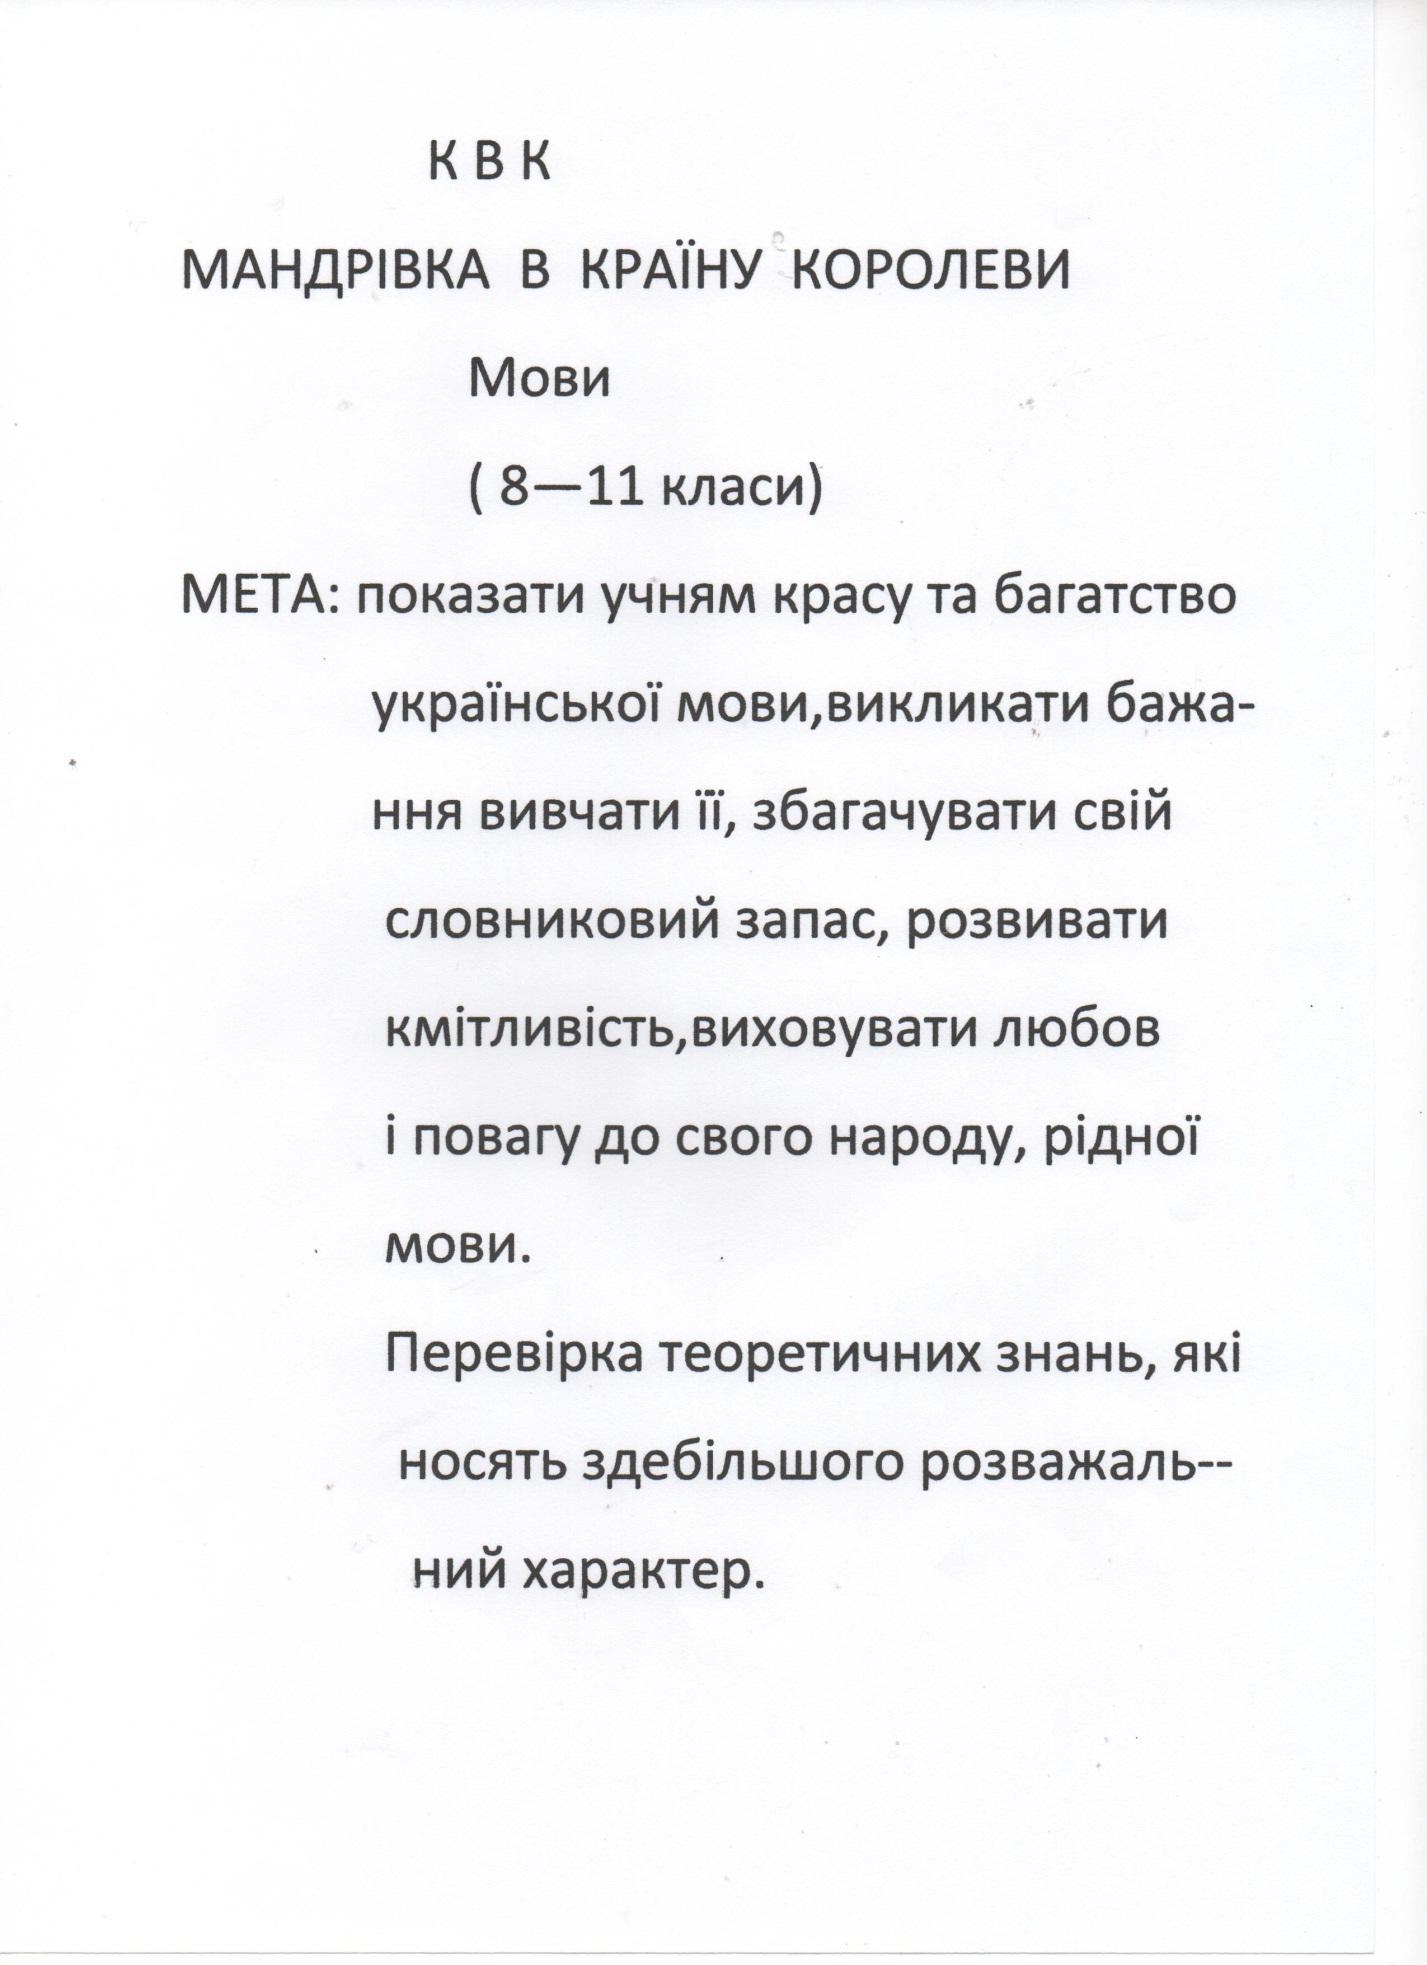 C:\Users\Валентина\Documents\отправка сайт\КВК\002.jpg